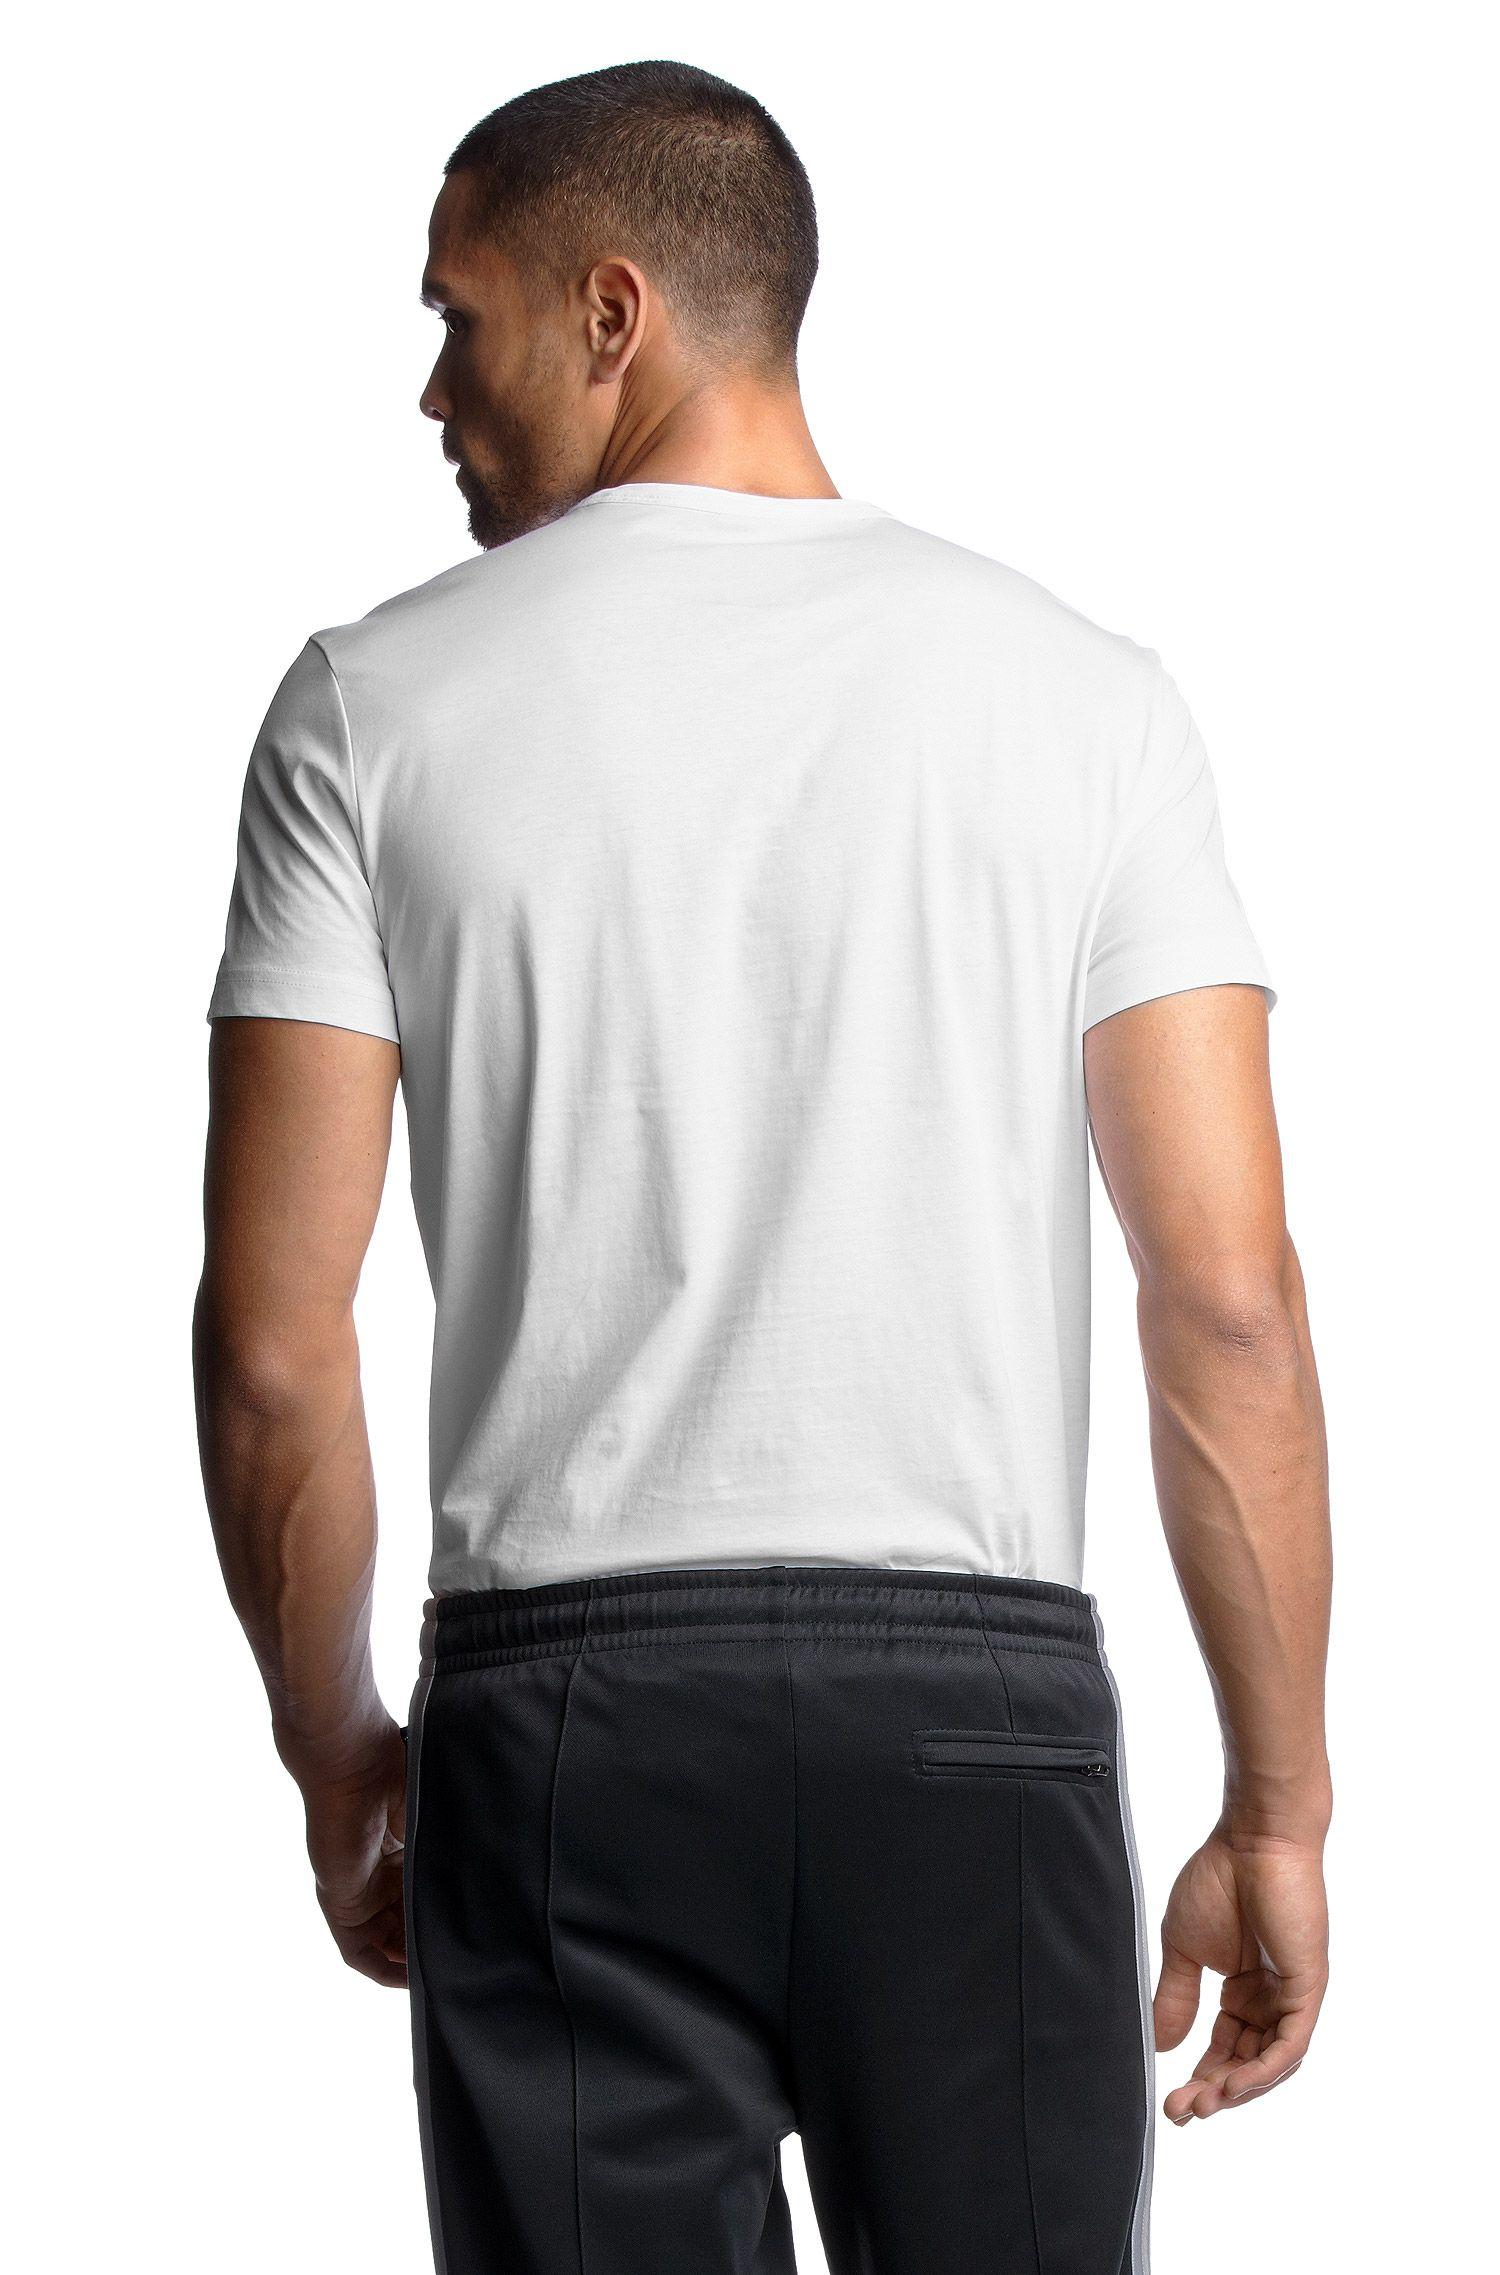 T-shirt en léger coton, Tee 3